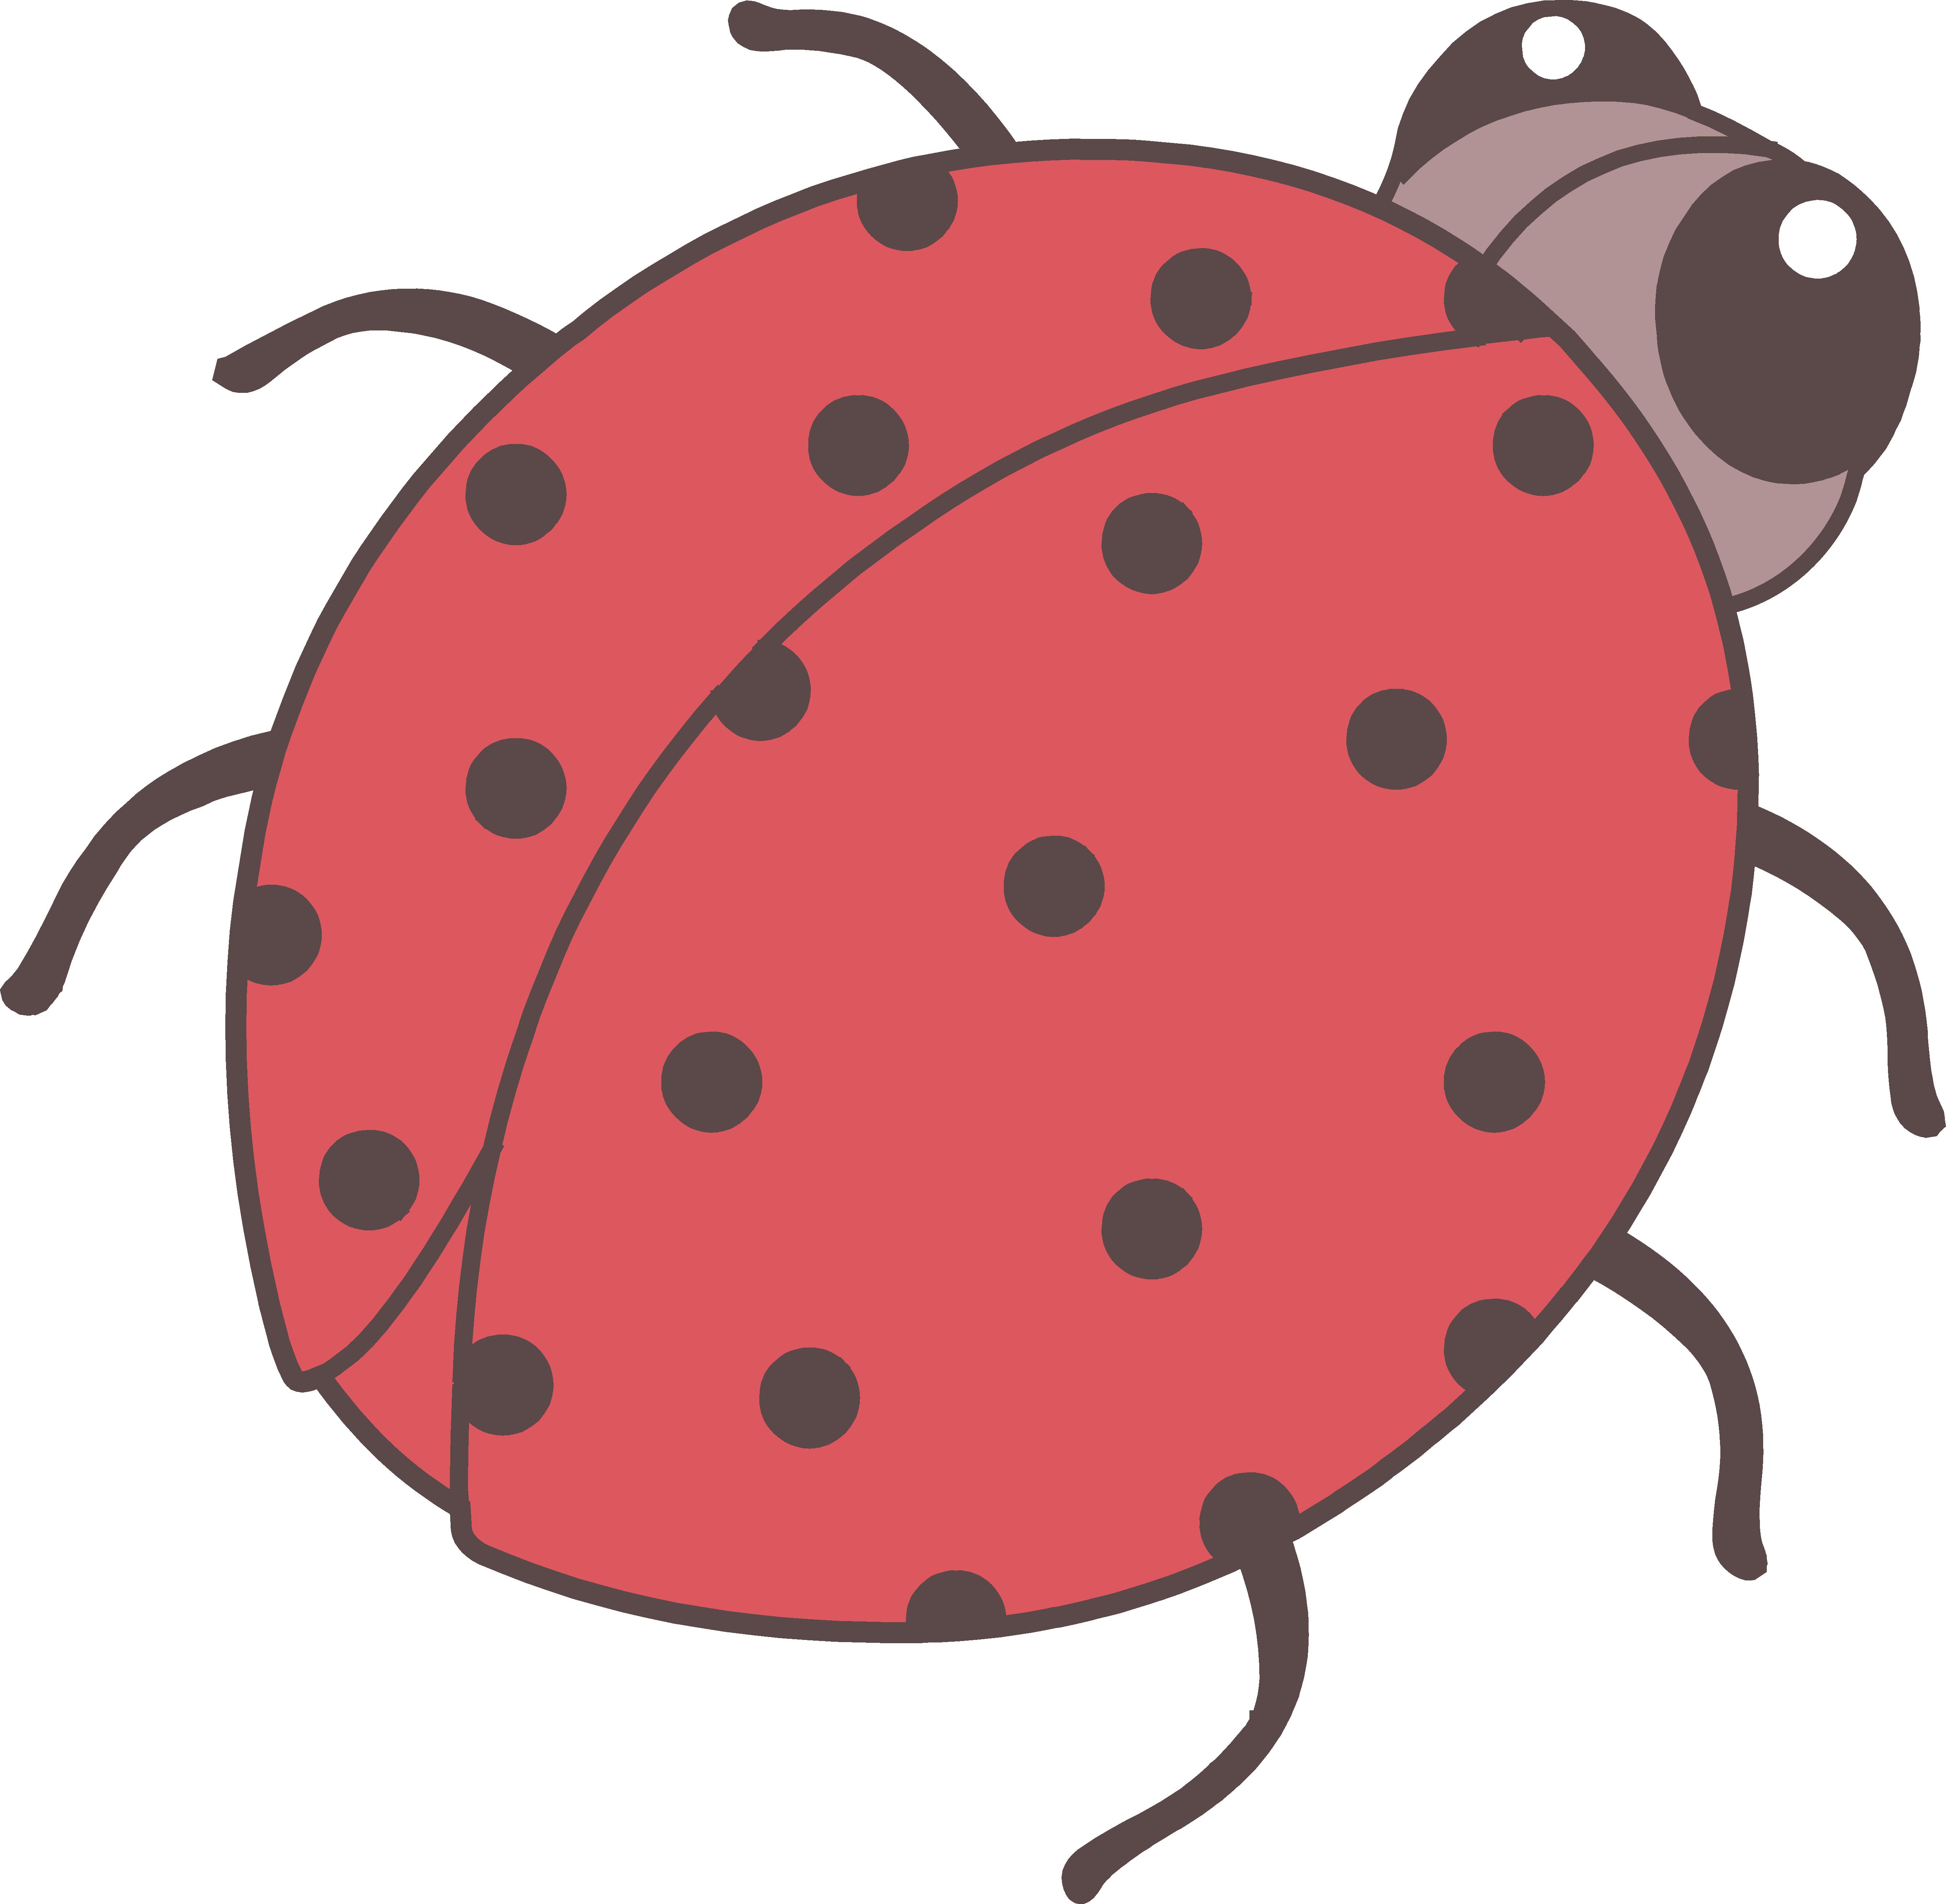 5364x5249 Beetle Clipart Cute